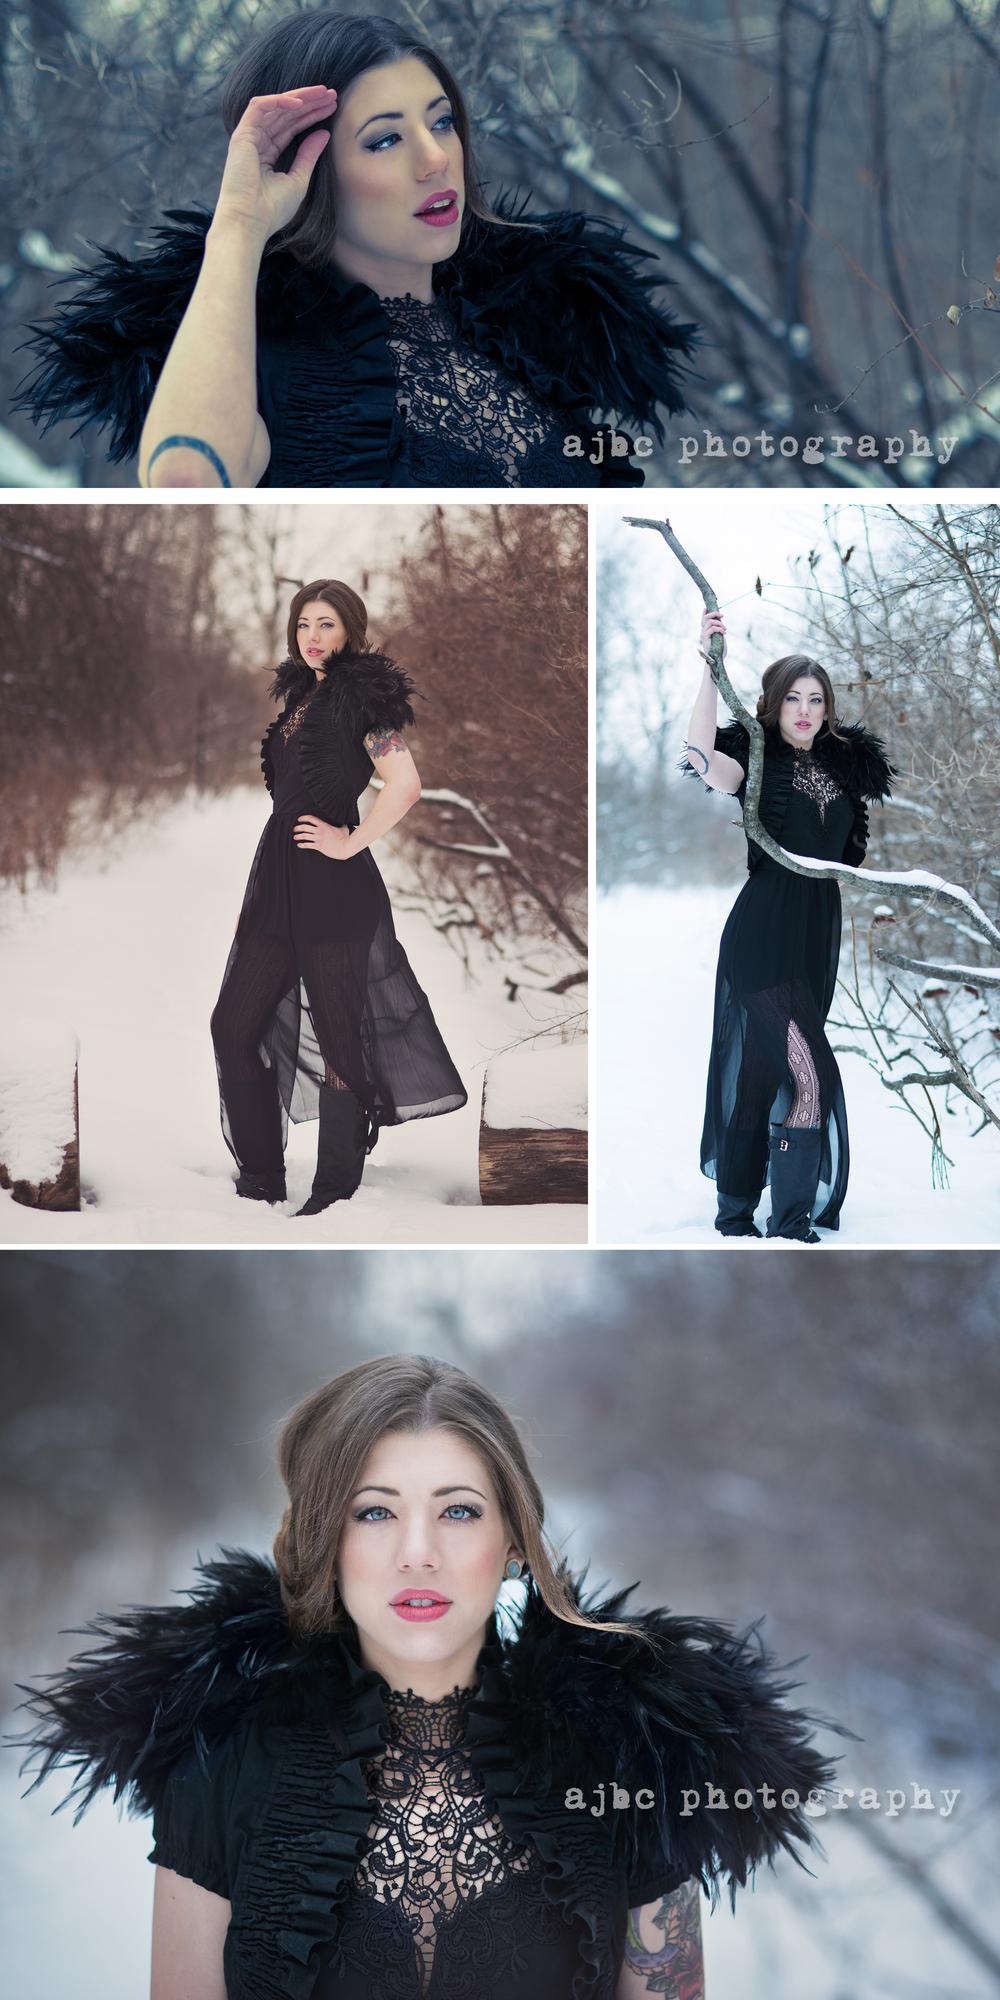 AJBCPhotography_Stylized_Creative_PortHuron_MI_1